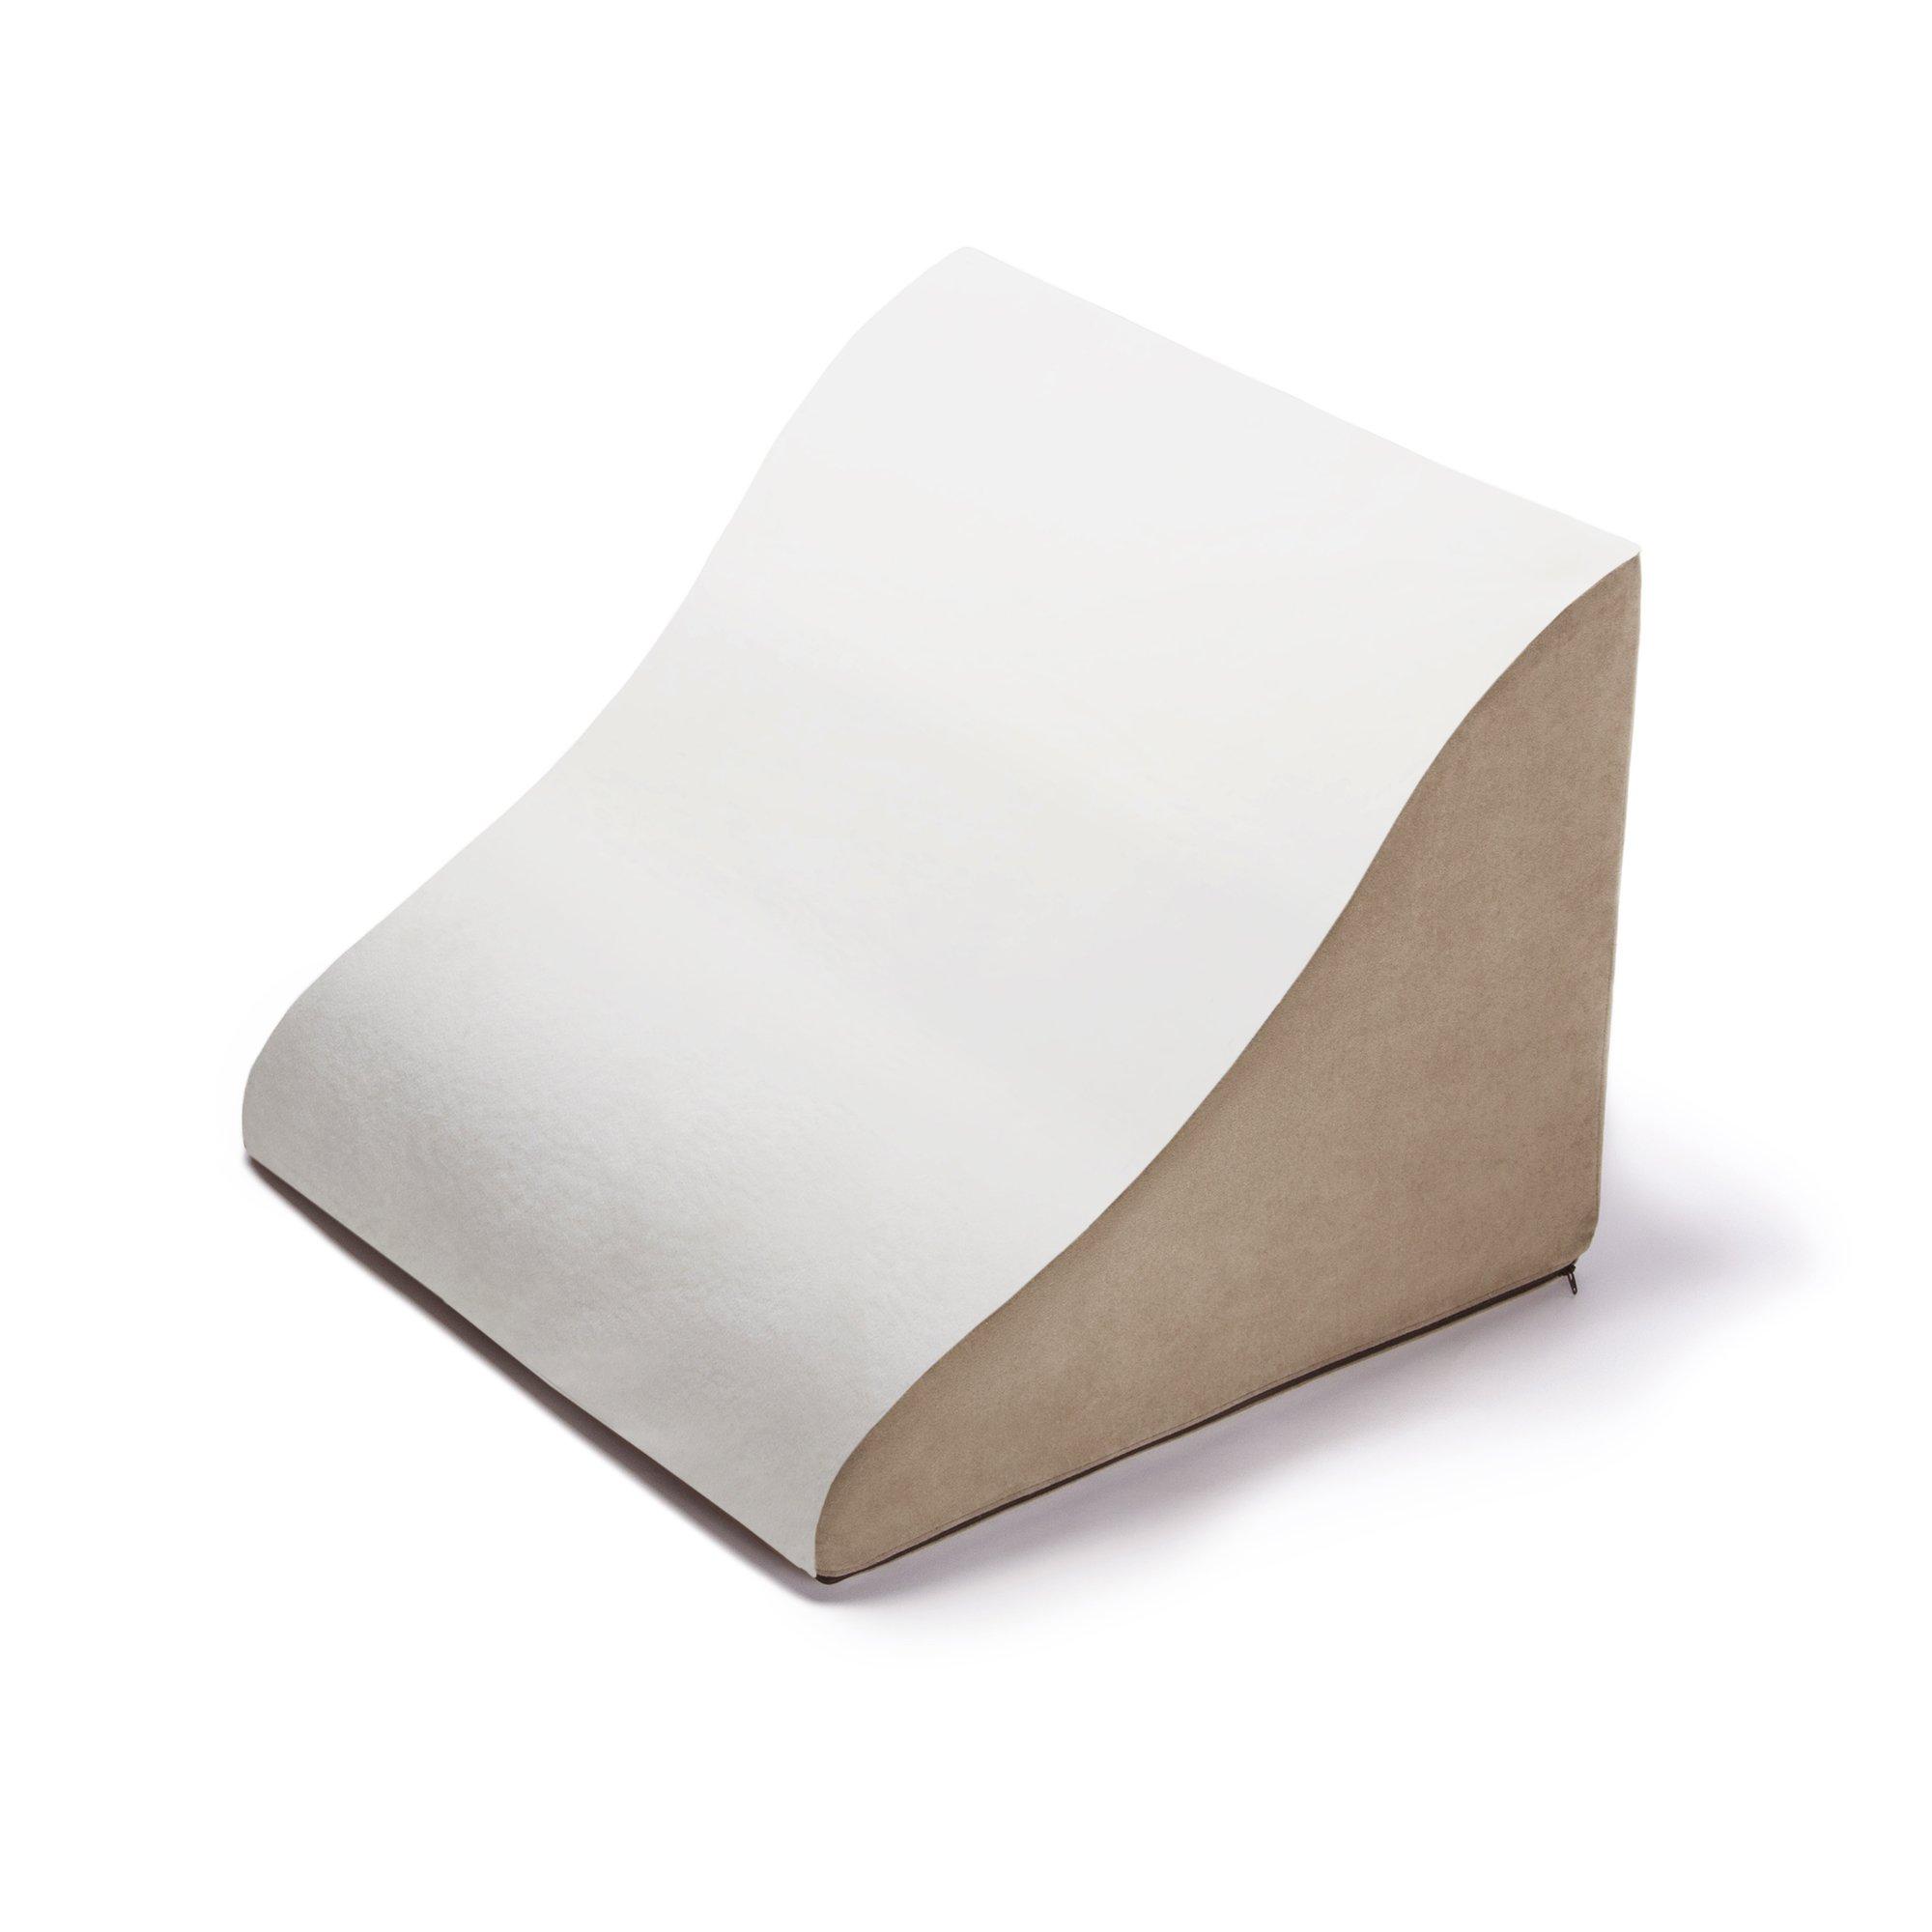 Avana Back Rest Memory Foam Back/Lumbar Pillow, Cloud/Camel